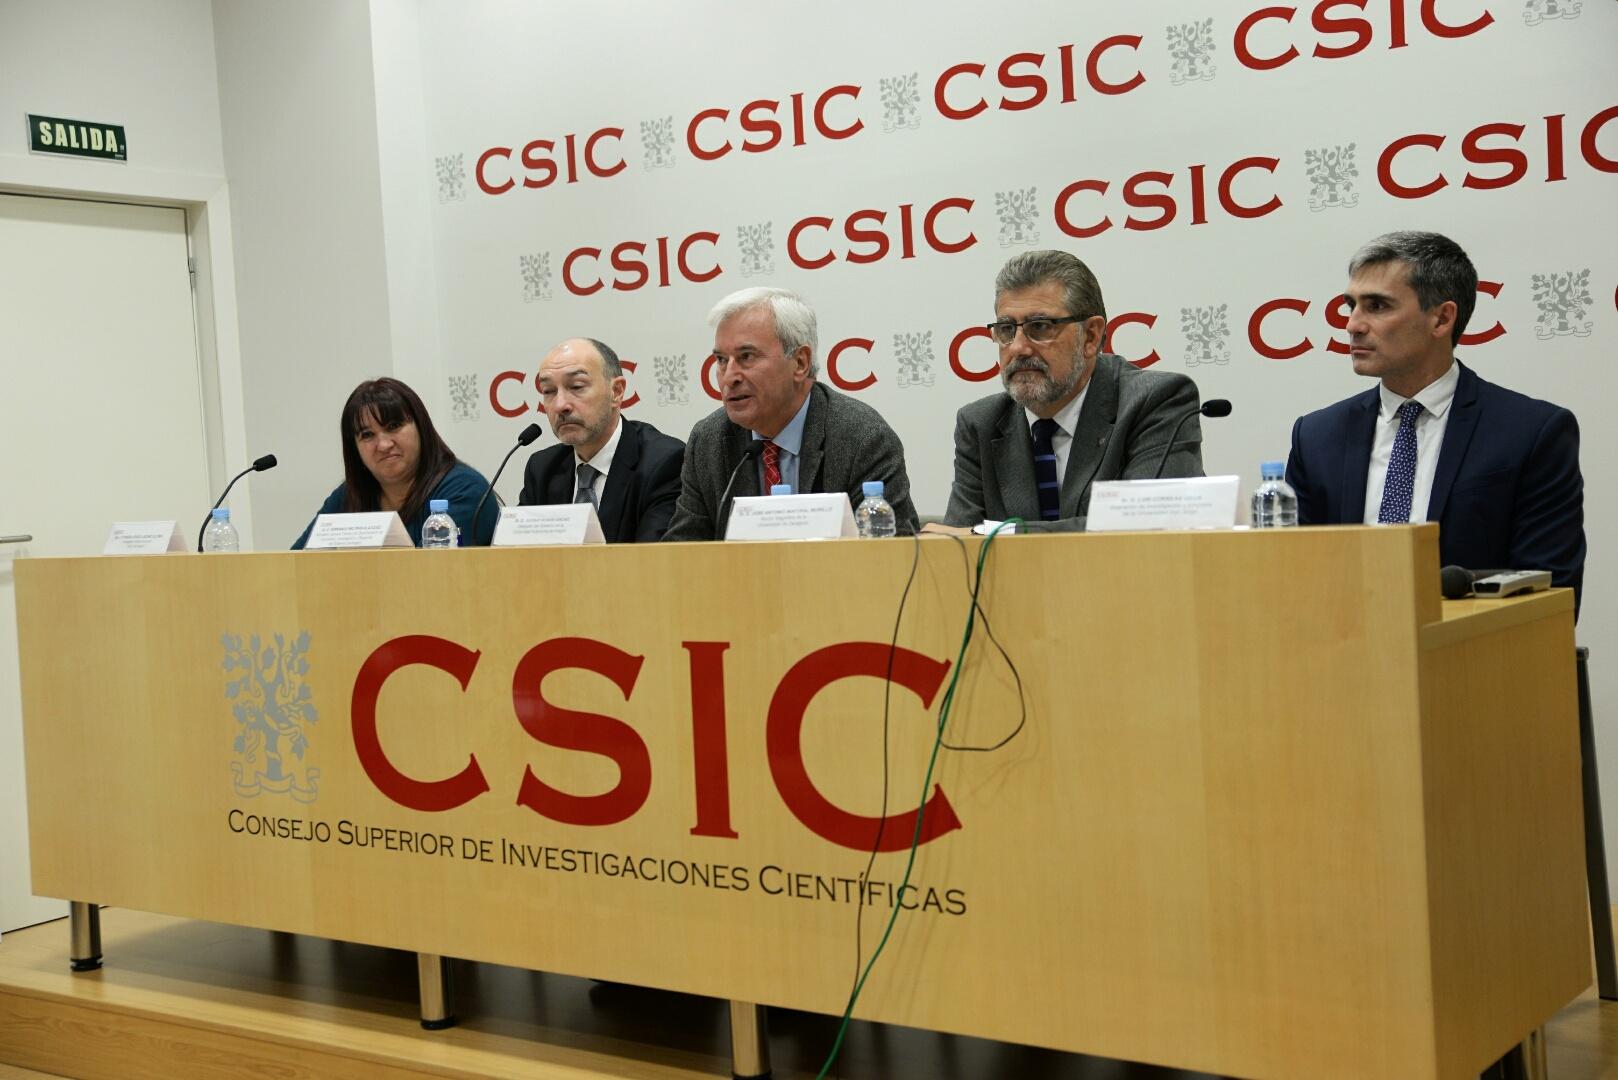 Semana de la Ciencia CSIC 1